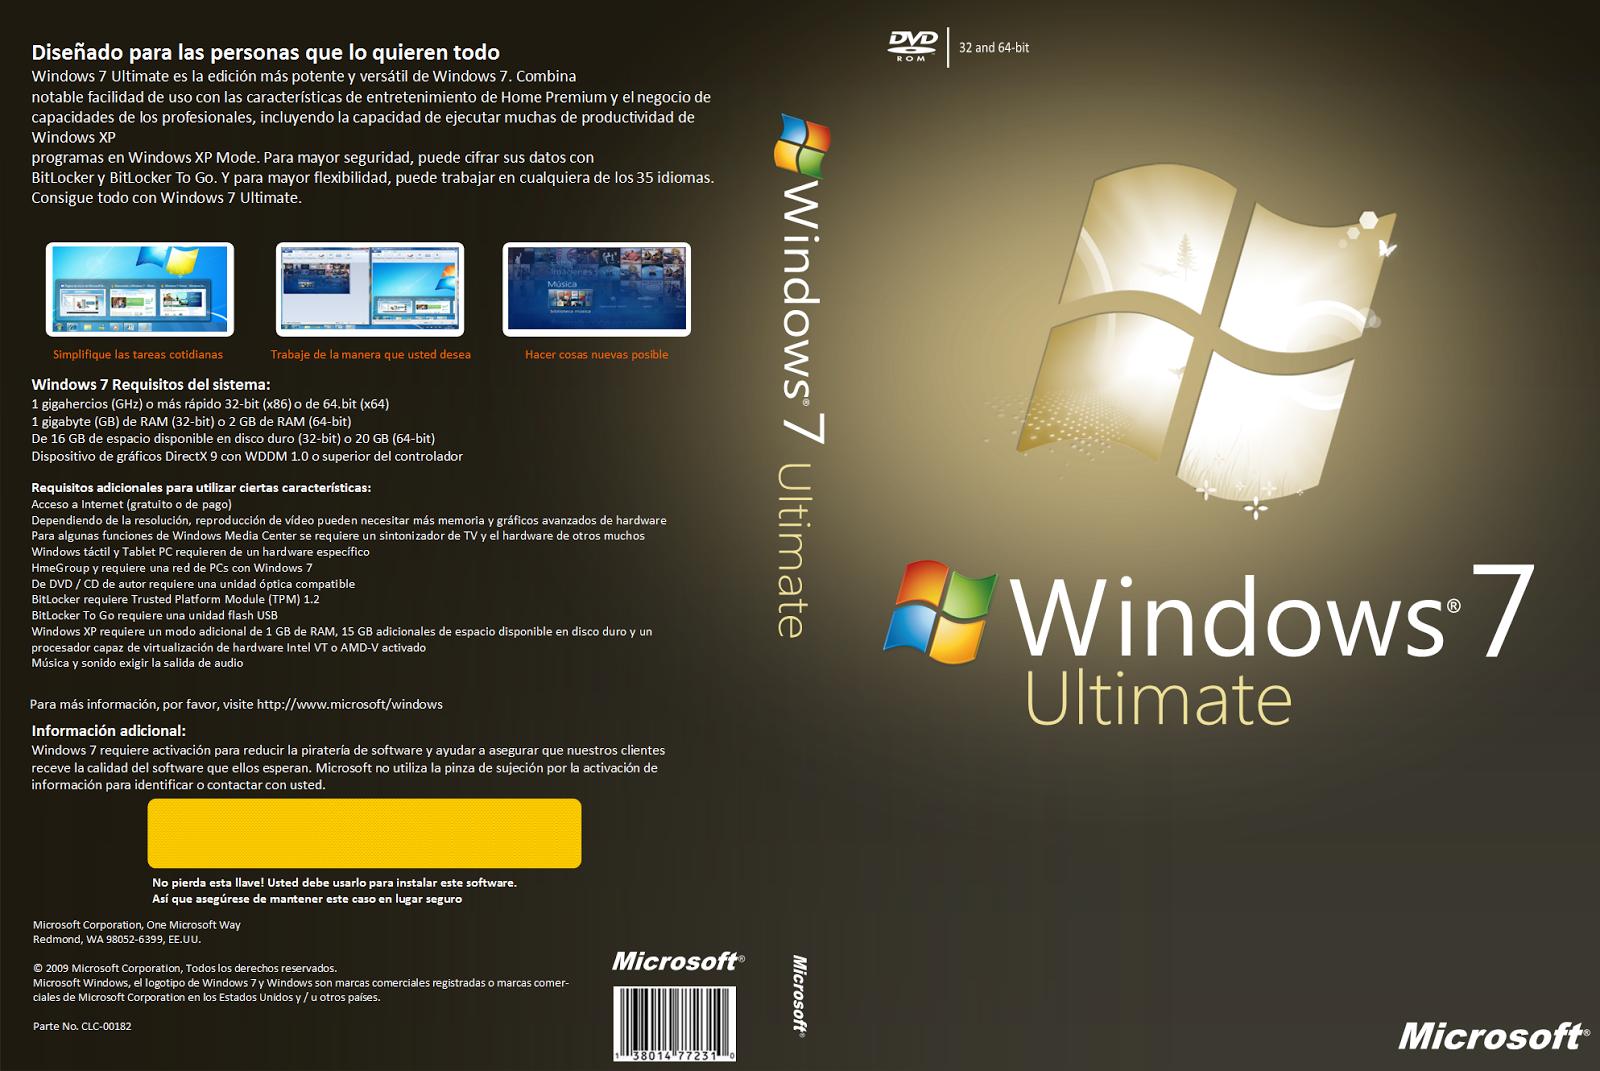 windows 7 ultimate 2009